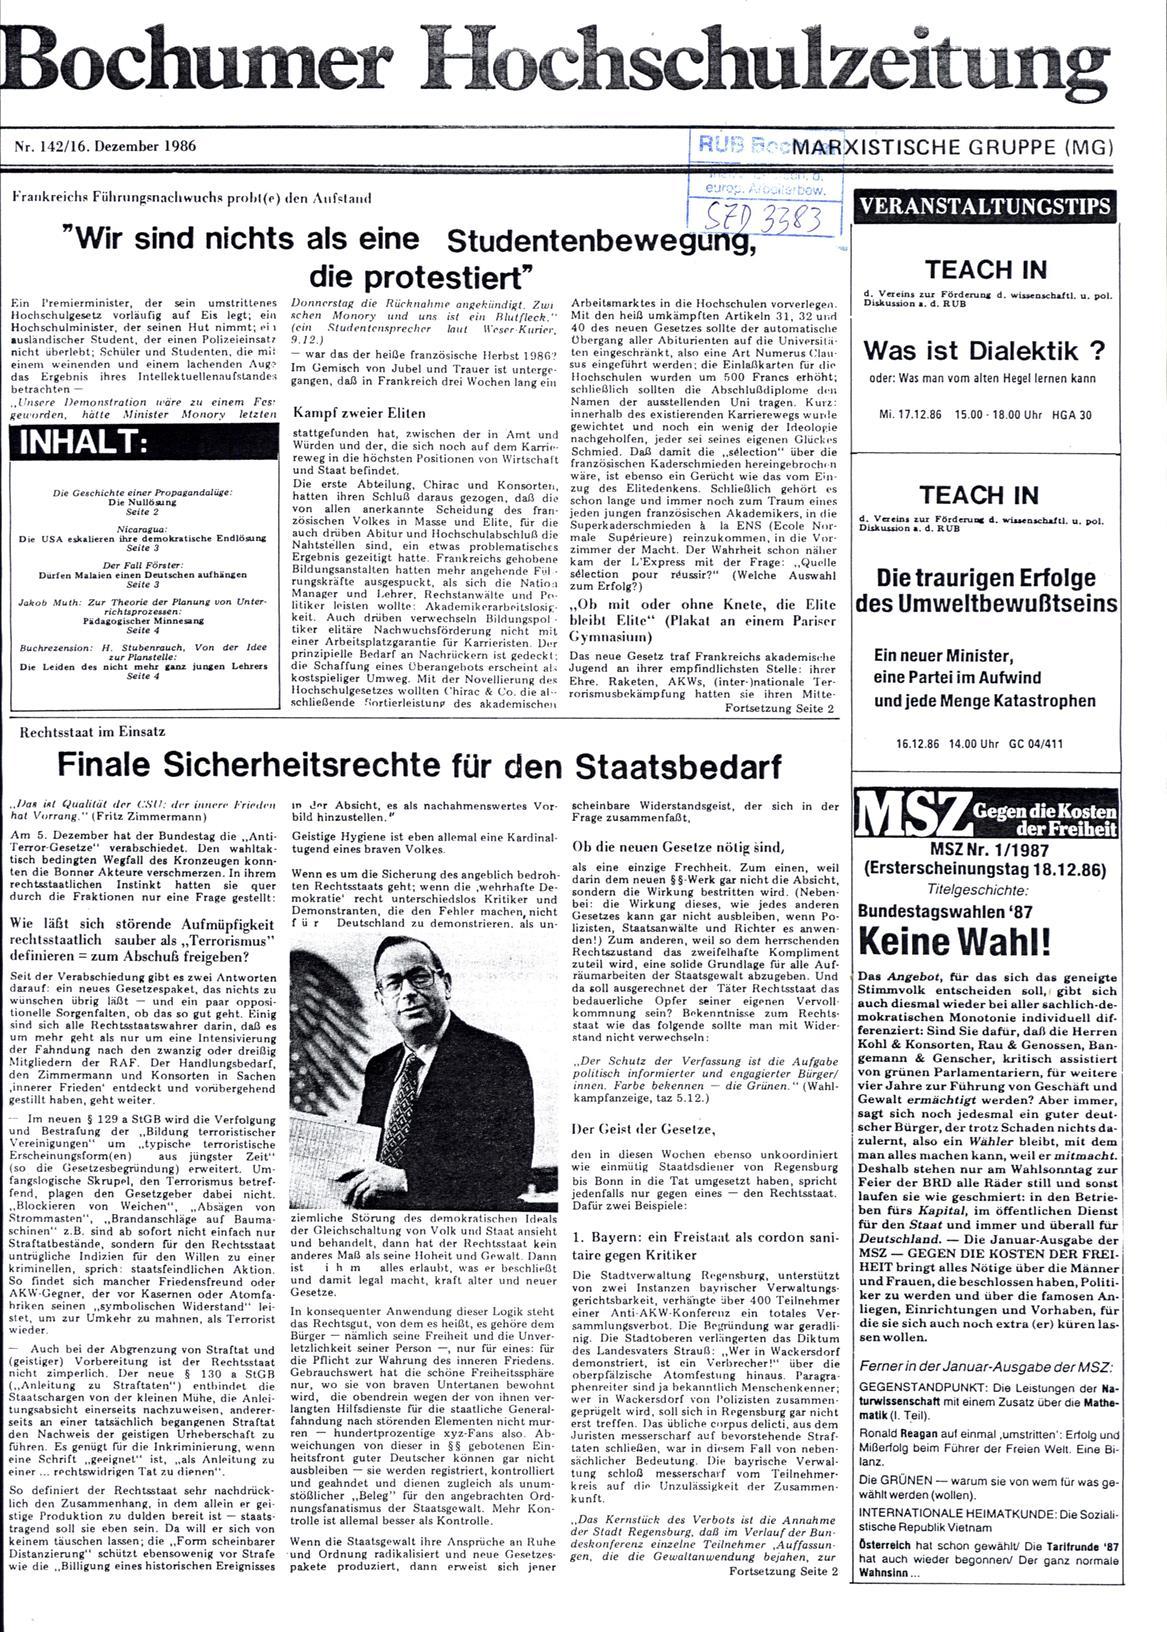 Bochum_BHZ_19861216_142_001